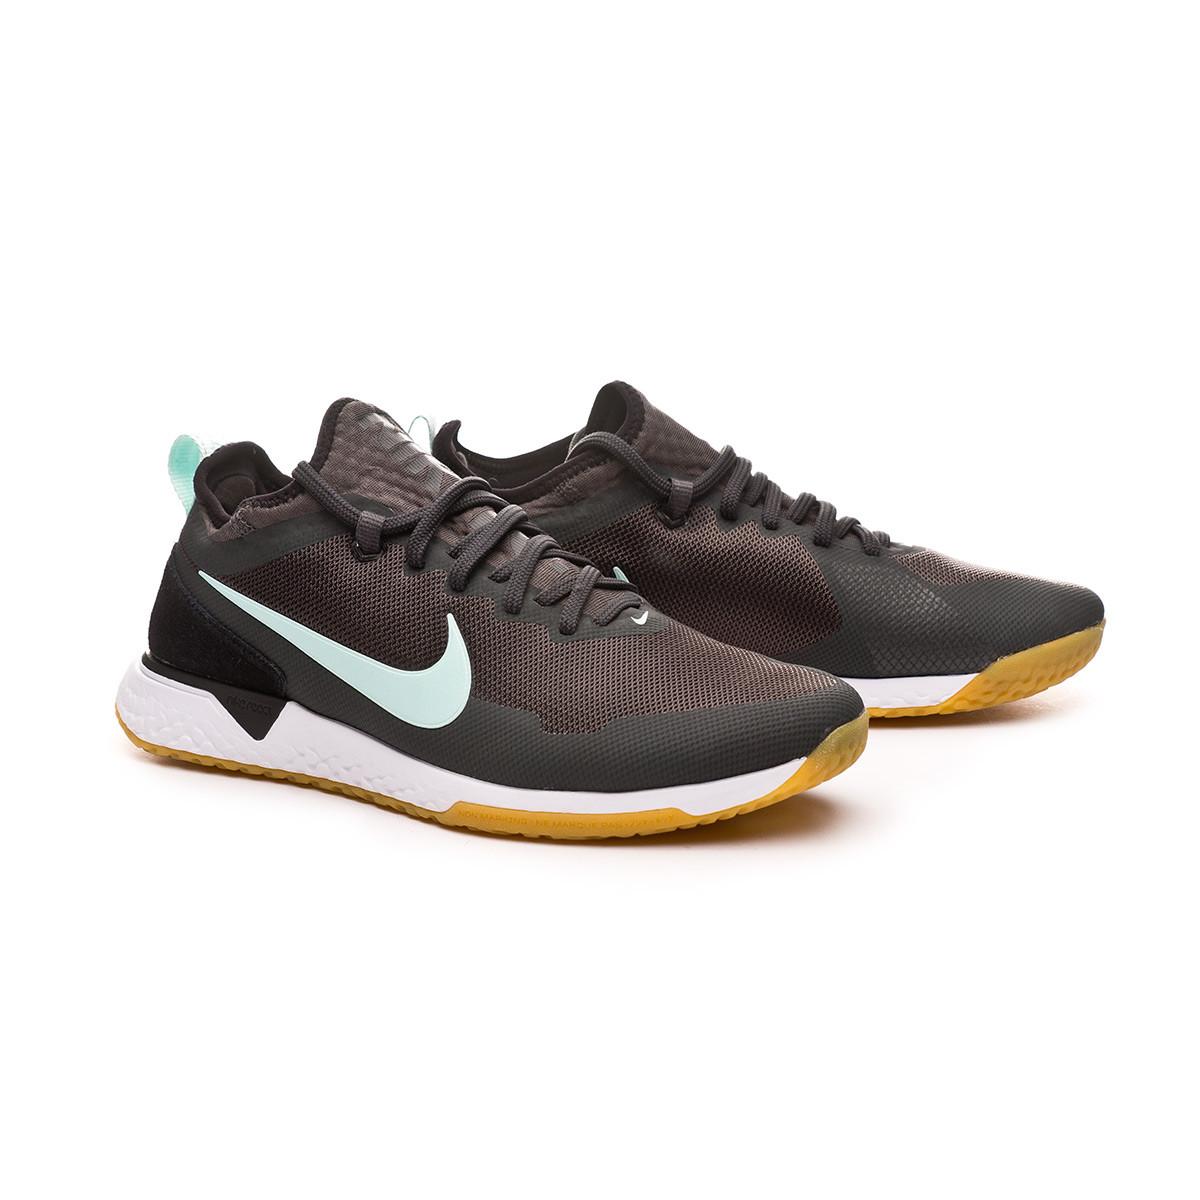 Sapatilha Nike Nike F.C. Anthracite Black Teal tint Loja